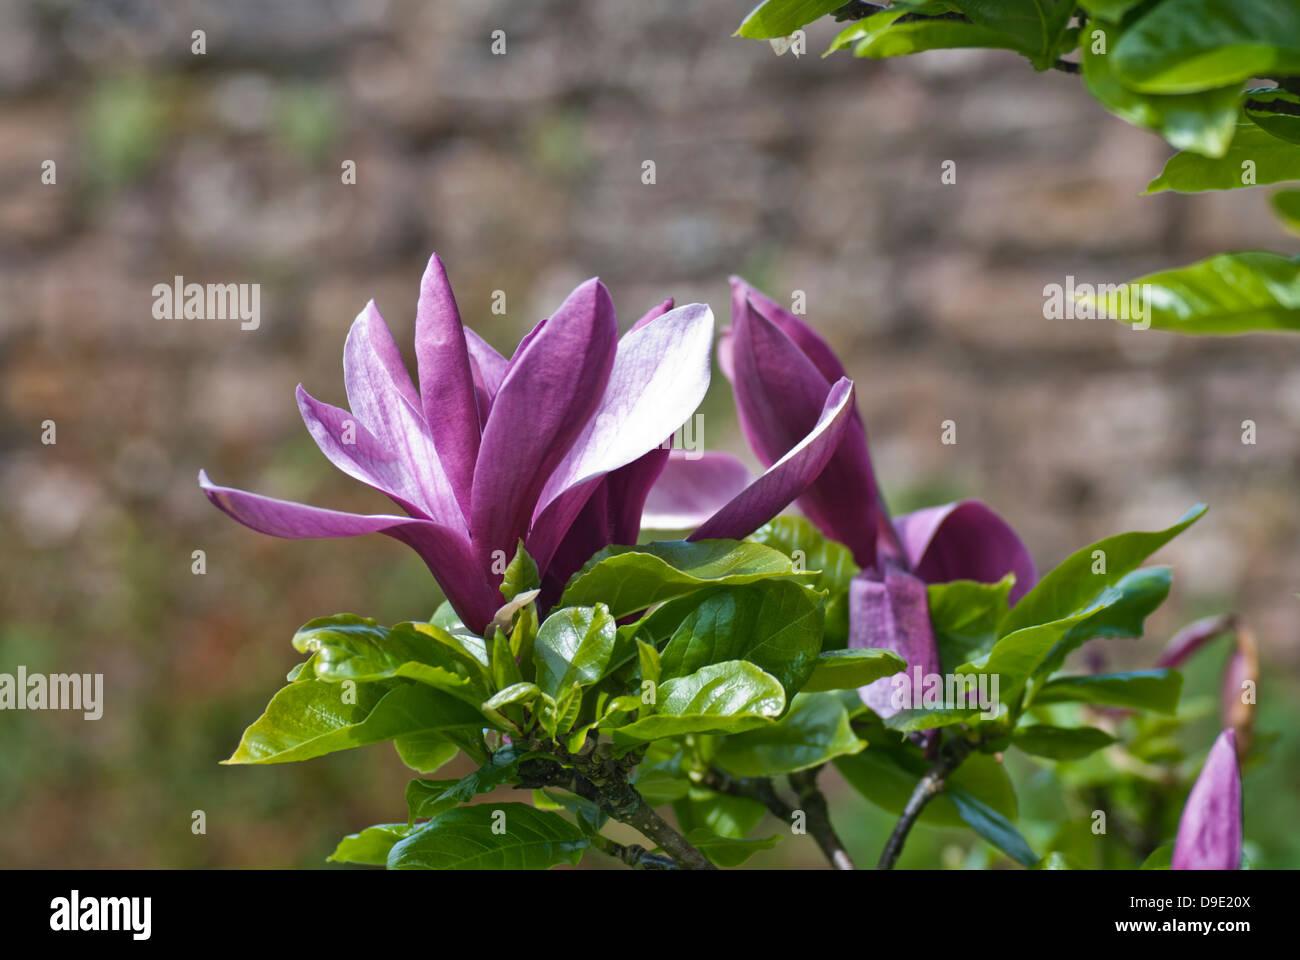 Black lily stock photos black lily stock images alamy magnolia lilliflora nigra black lily magnolia stock image izmirmasajfo